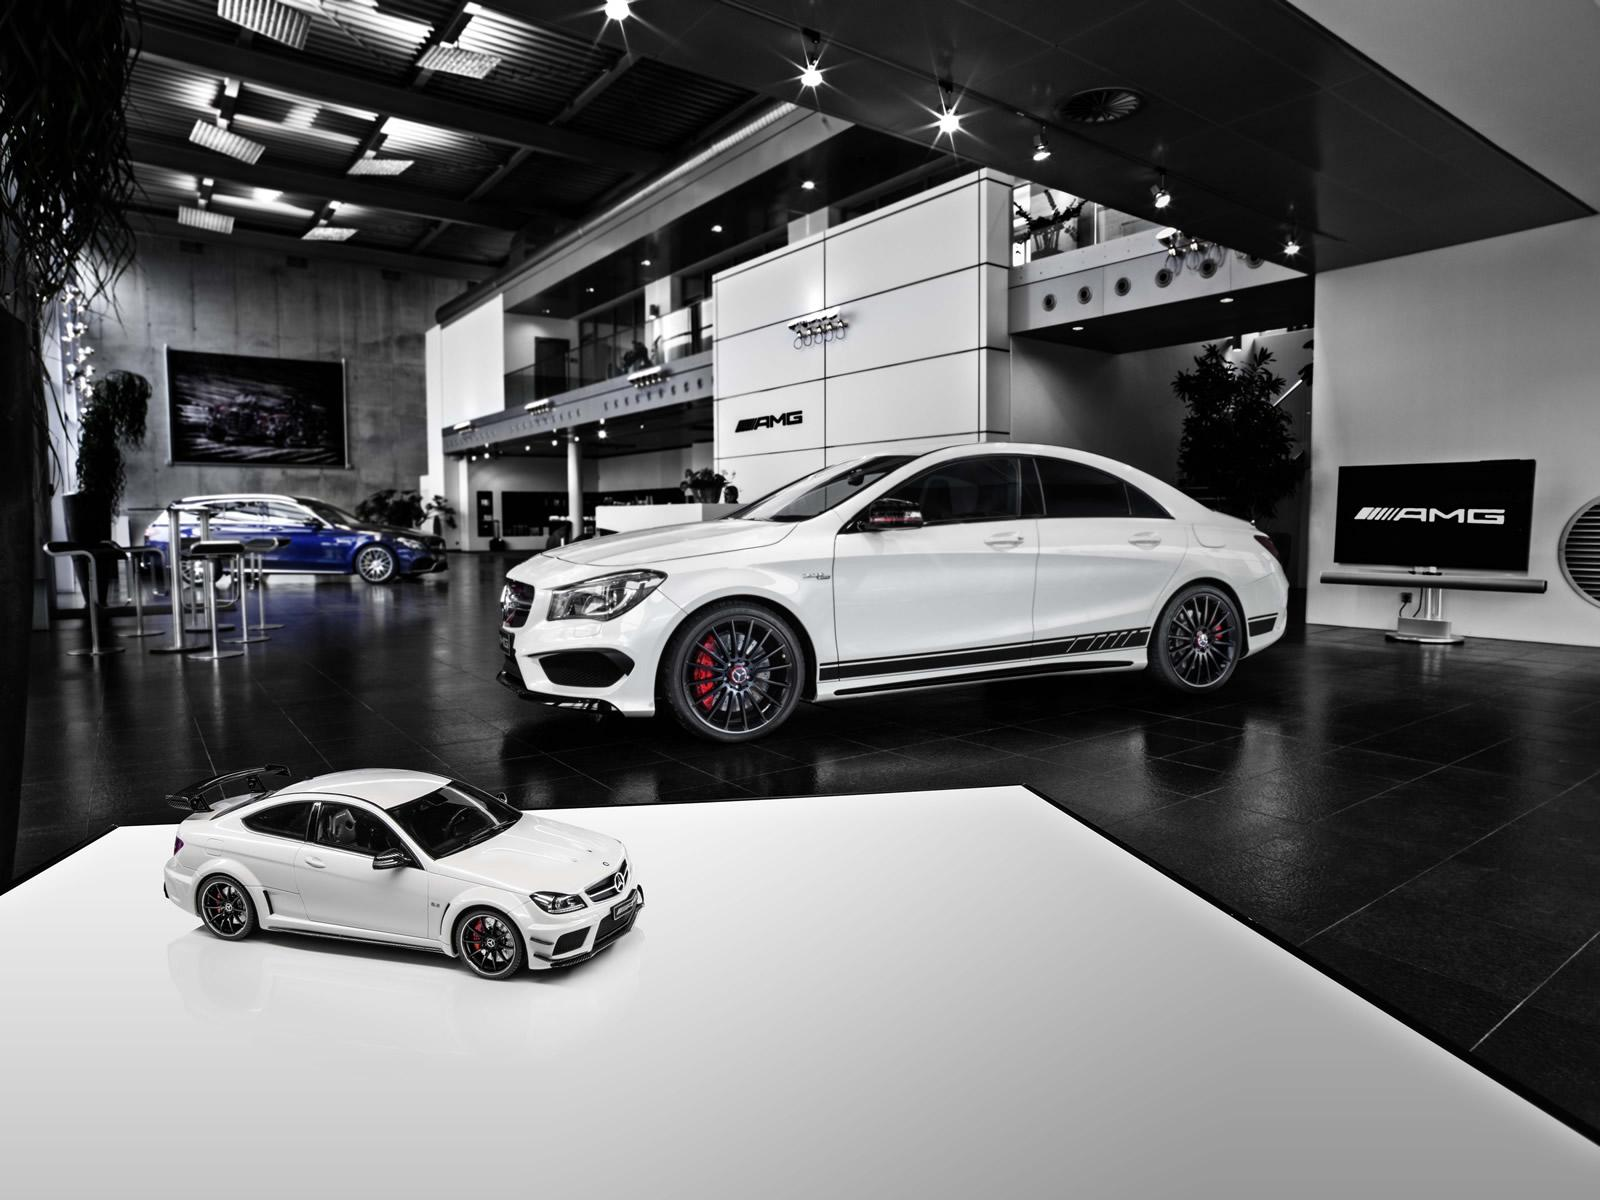 Mercedes g65 amg leads mercedes amg limited edition white for Mercedes benz limited edition